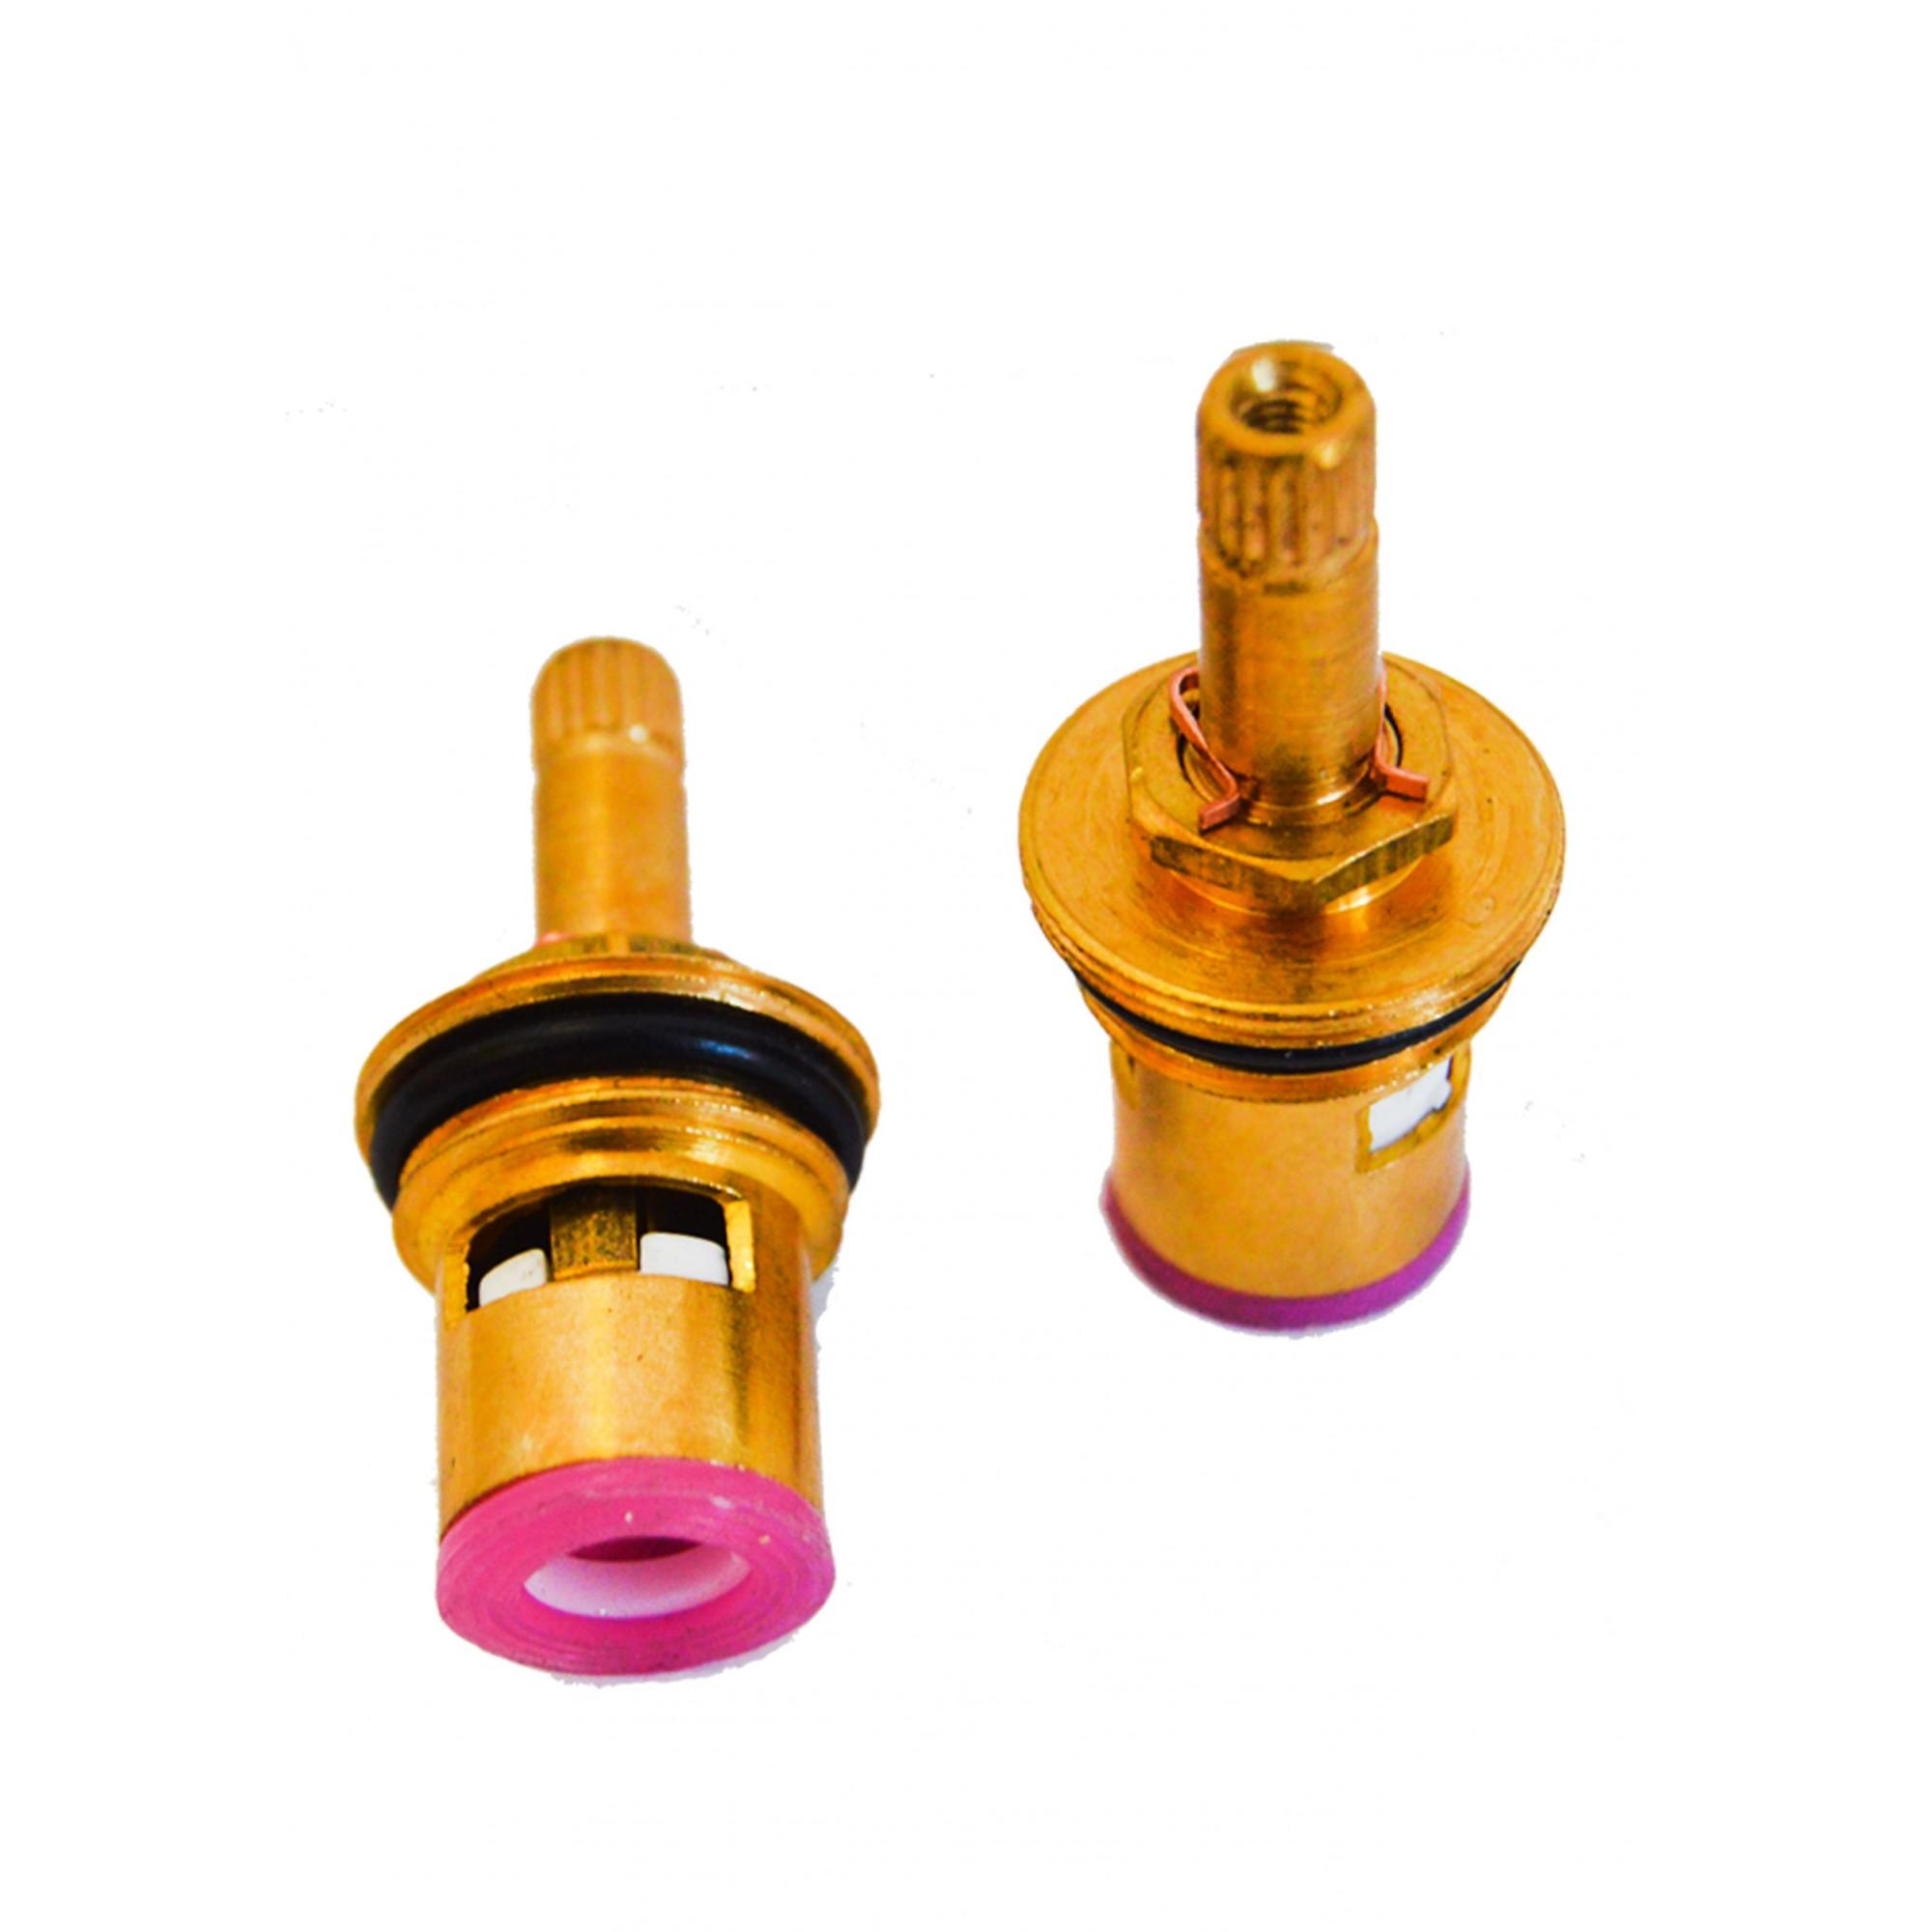 Кран-букса MAYFAIR 1/2 керамика, 20 шлицов,14.5 мм ANGO - 1